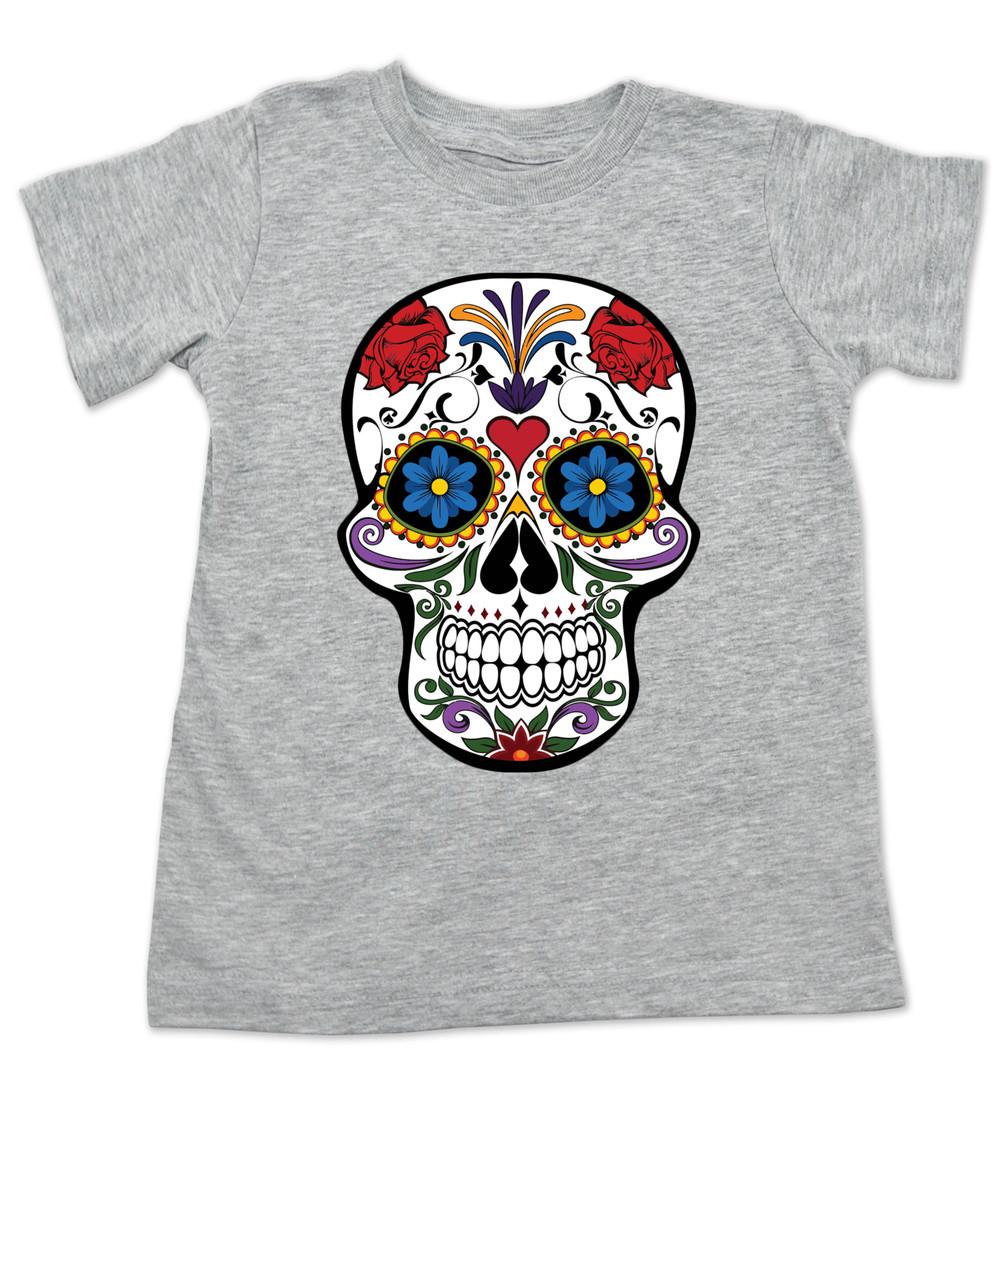 6d1d91cfc Dia de los Muertos toddler shirt, colorful sugar skull t-shirt, Day of